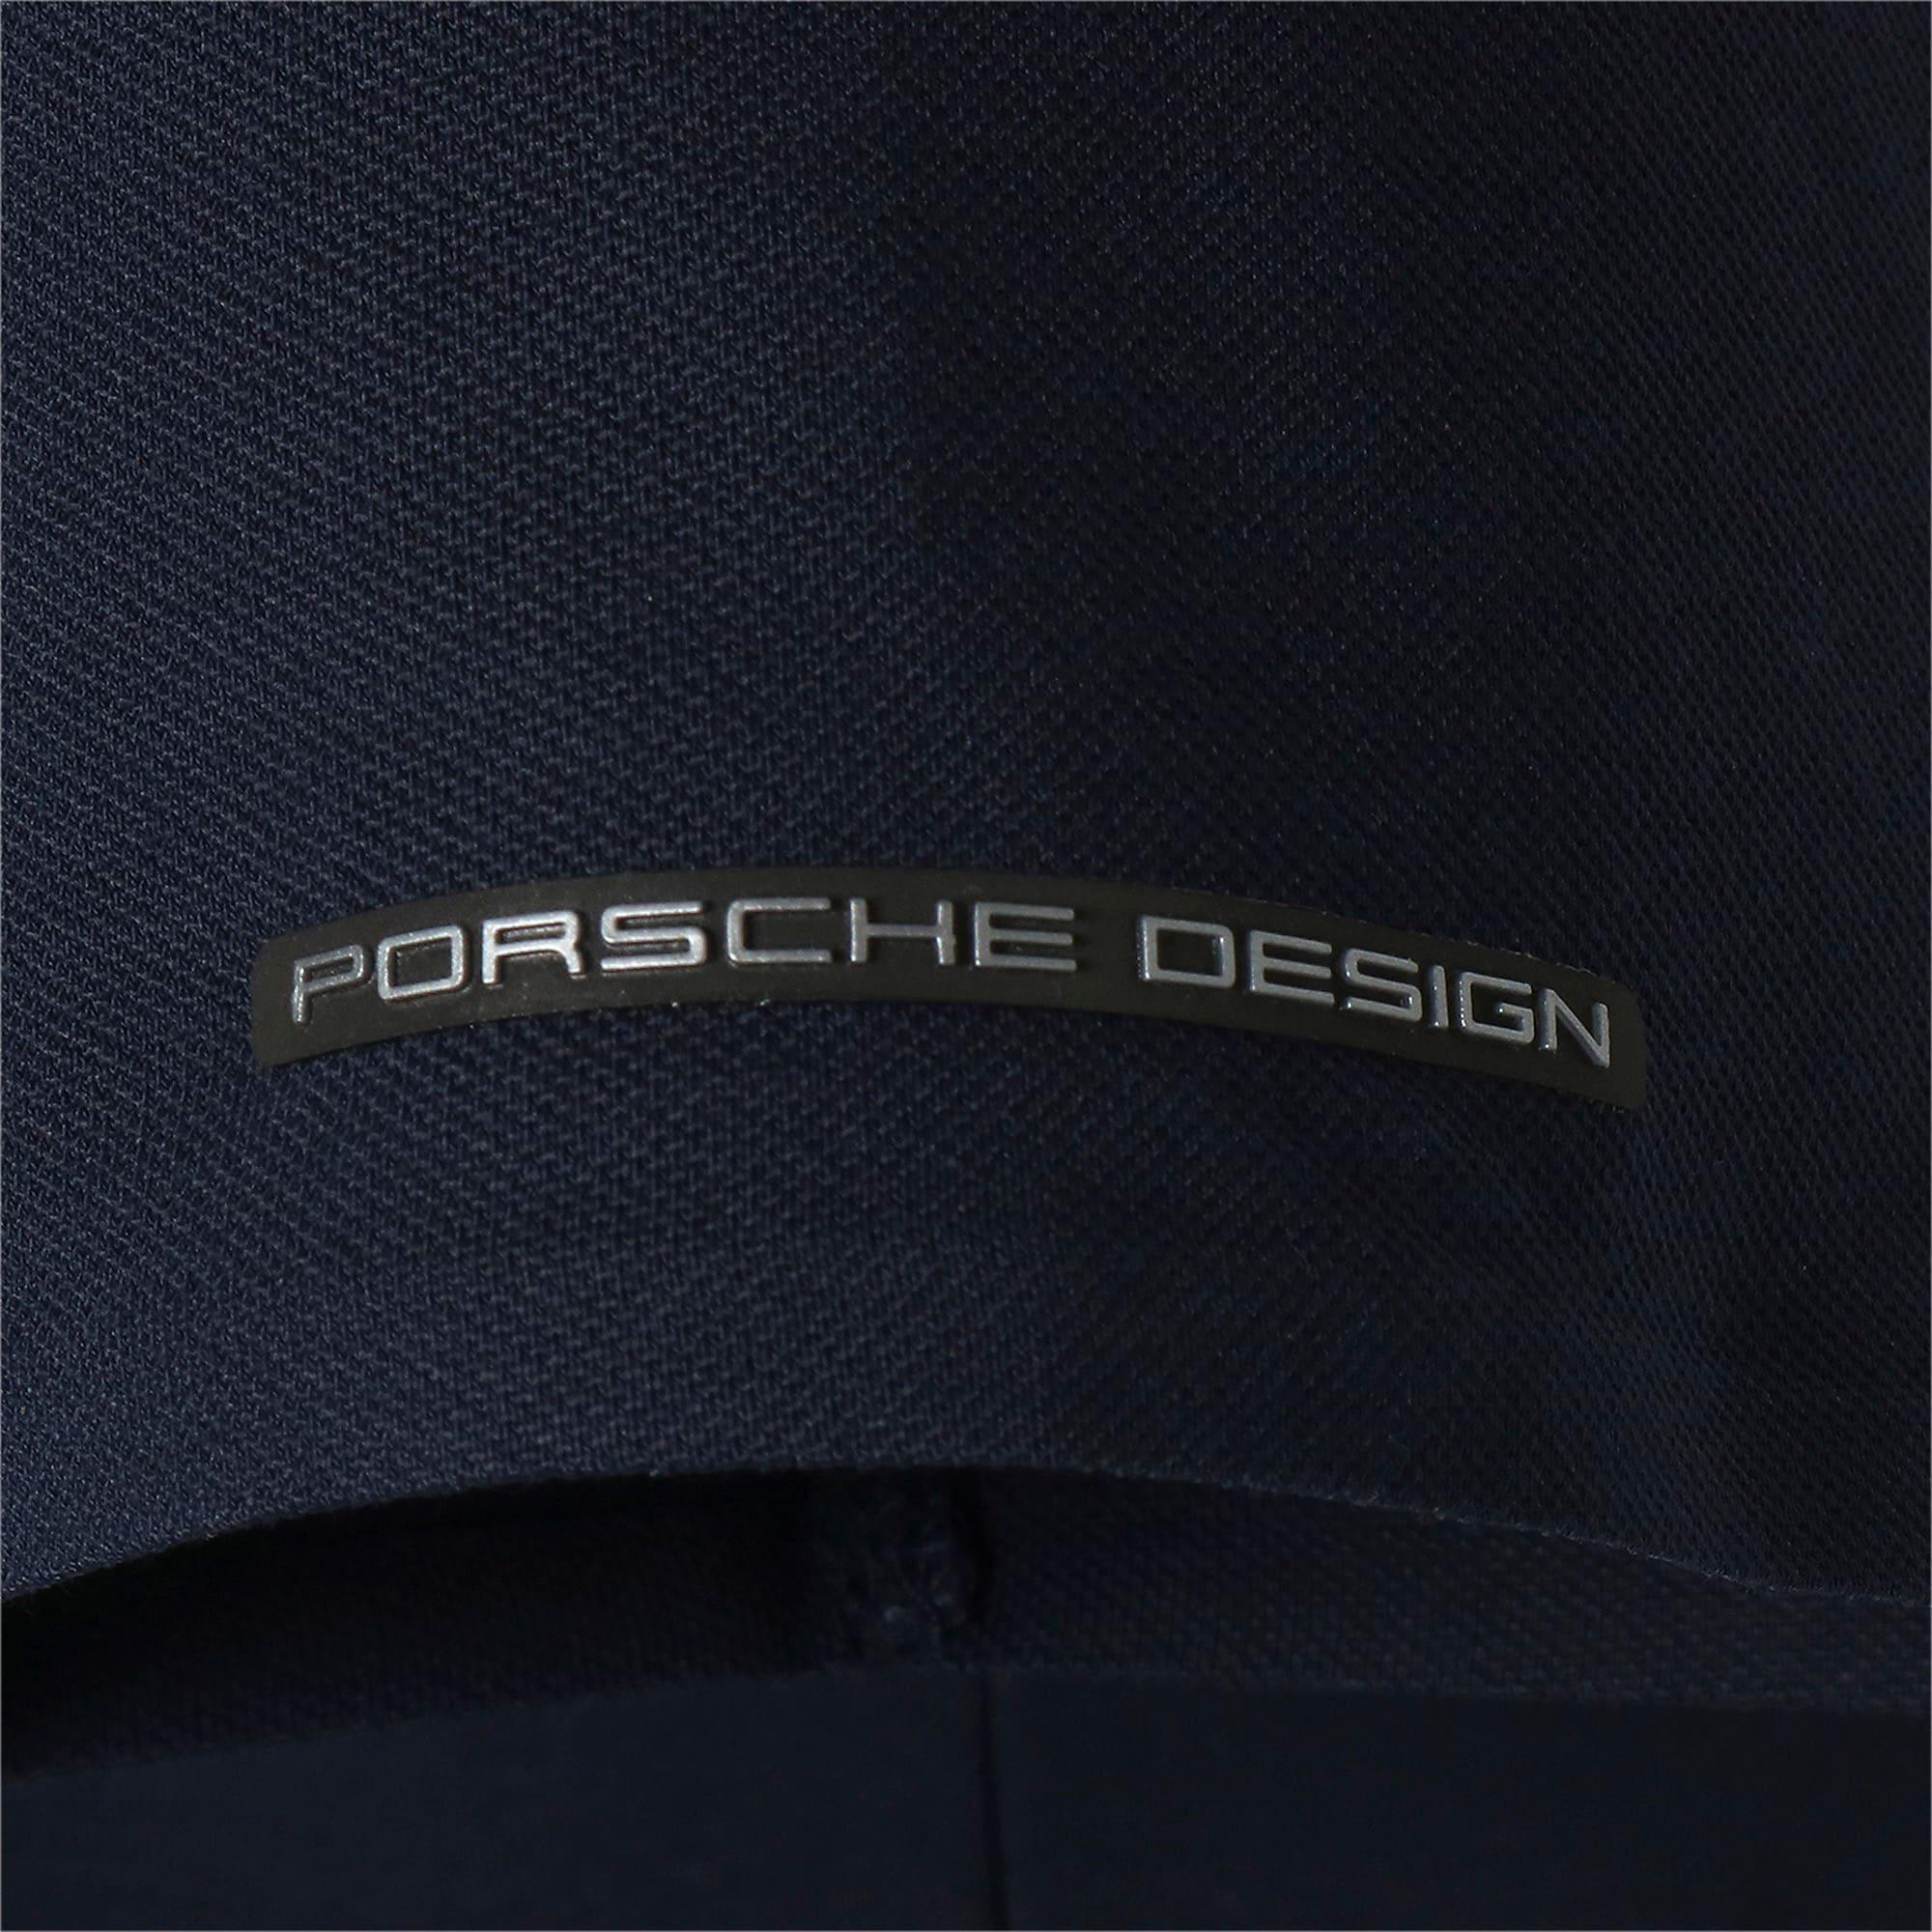 Thumbnail 9 of PORSCHE DESIGN  ライフポロ, Navy Blazer, medium-JPN